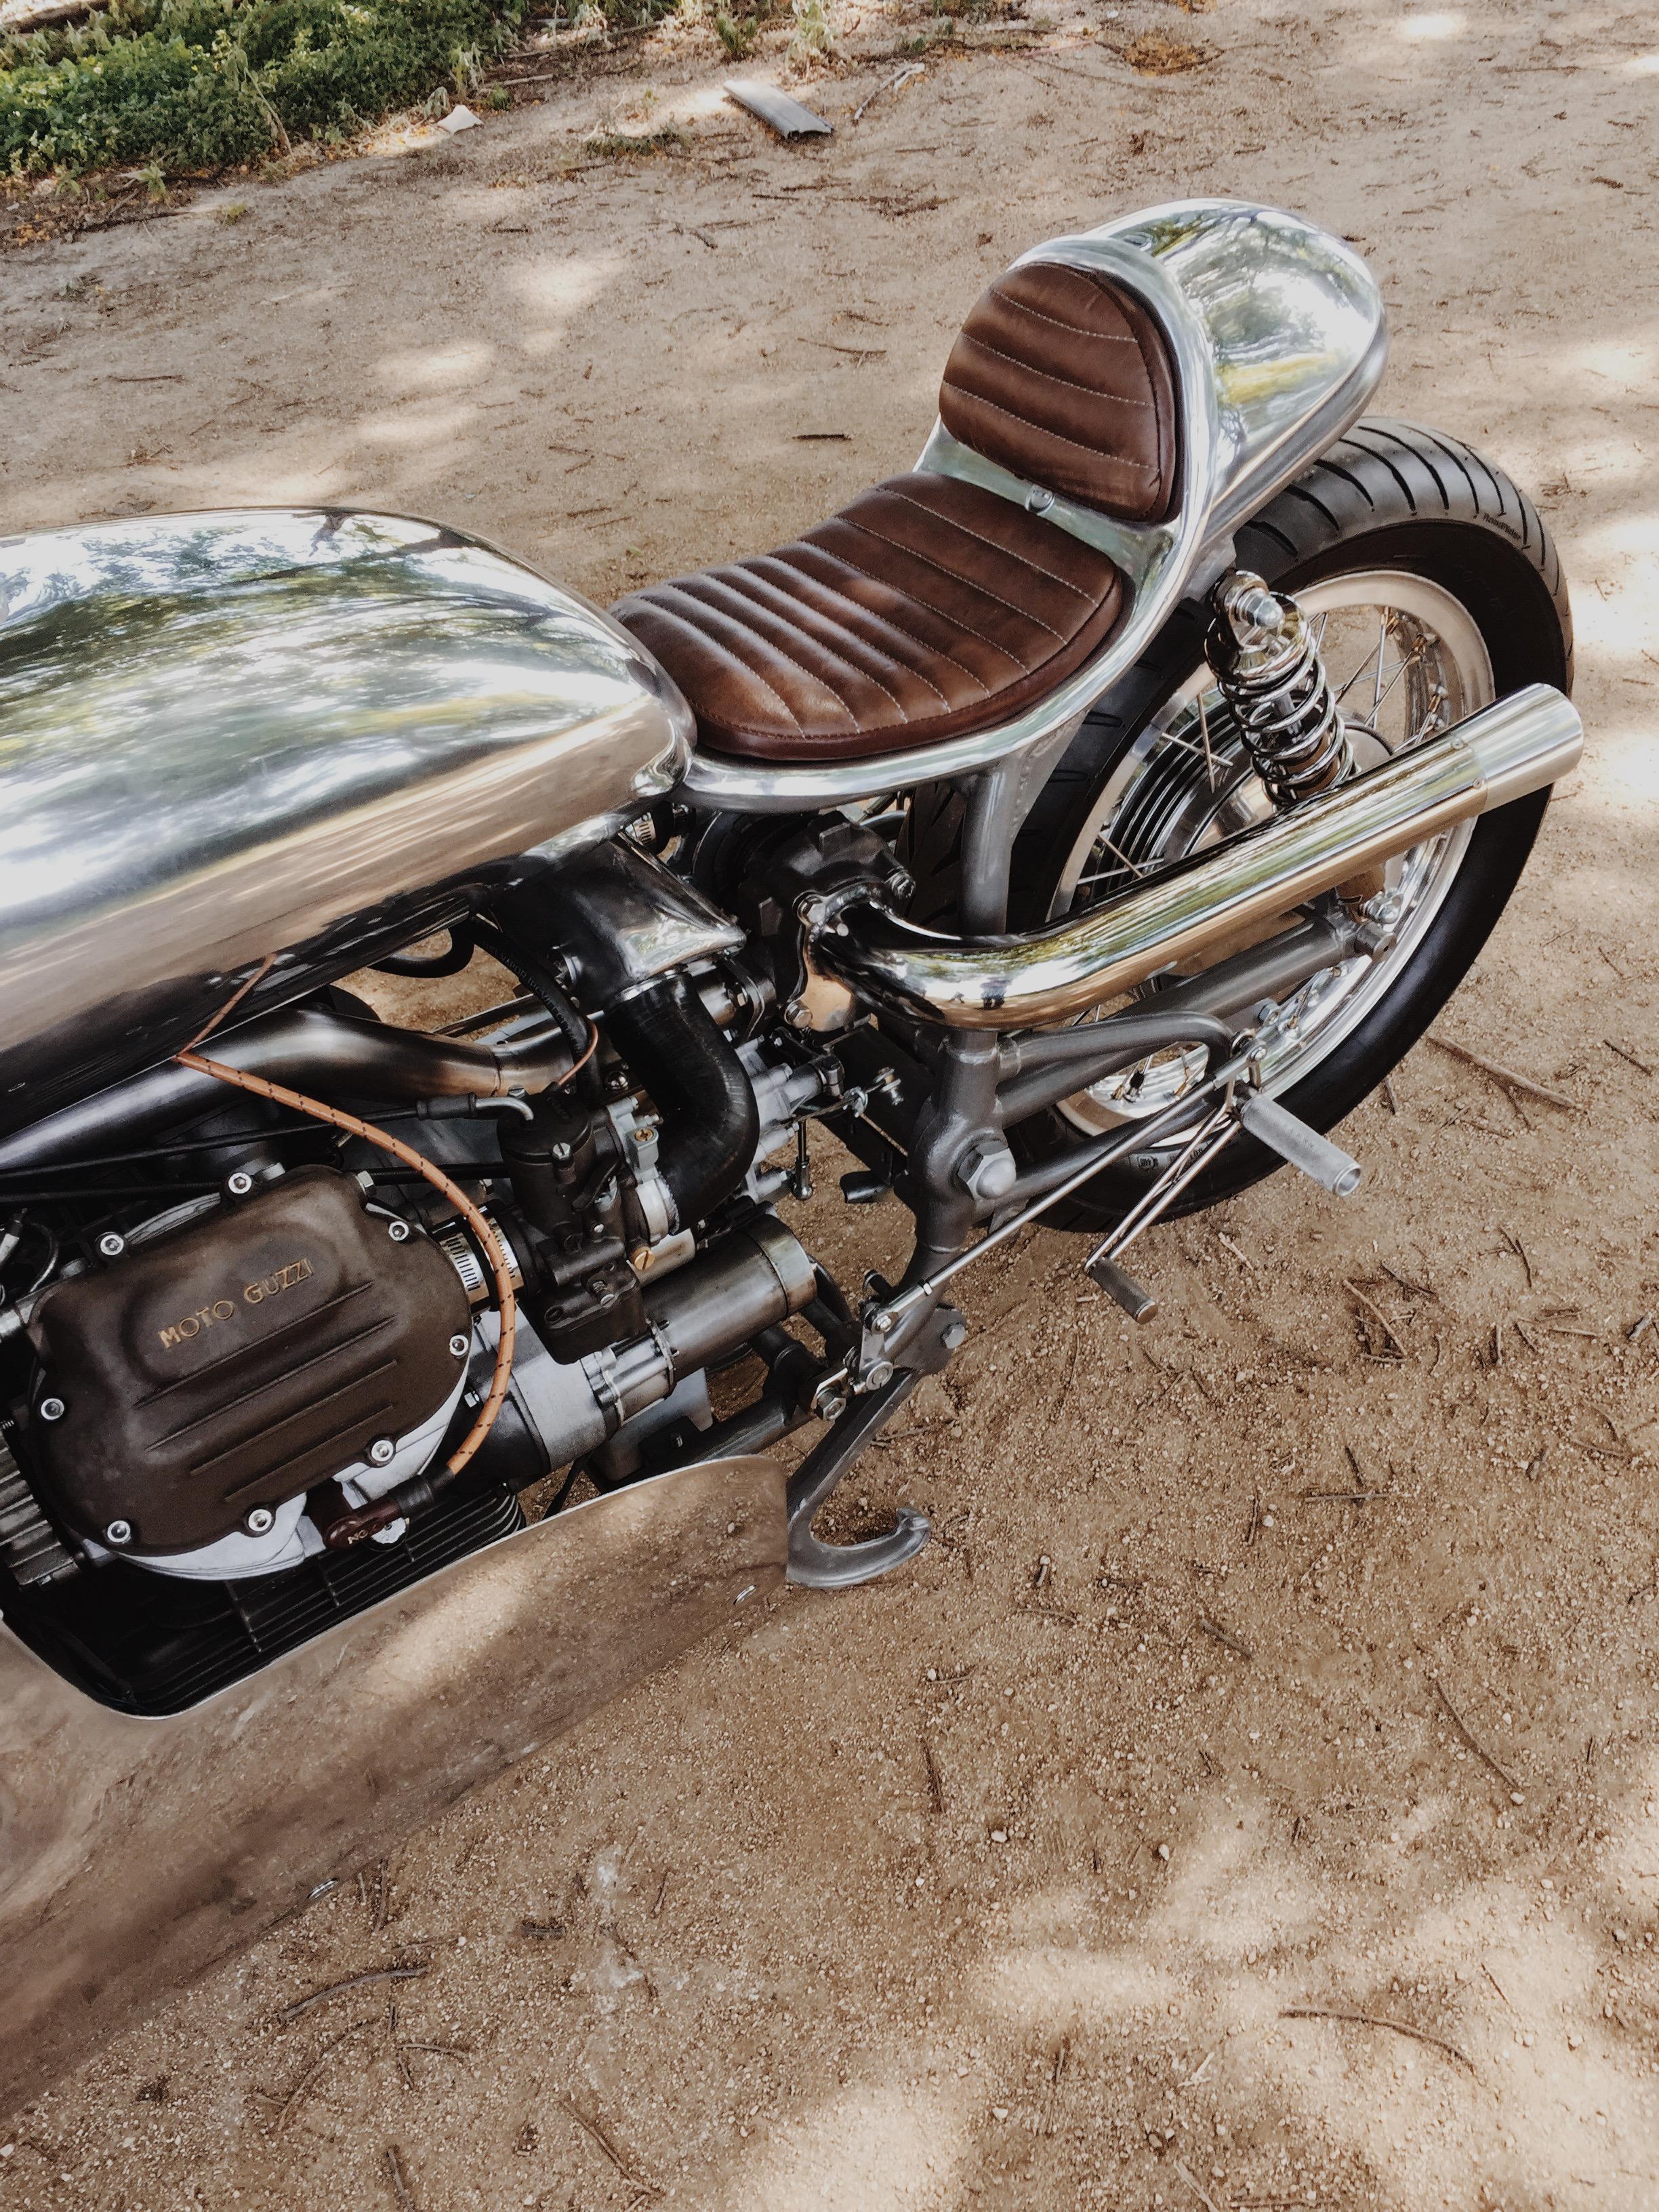 Craig_Rodsmith_Turbo_Moto-Guzzi_Dustbin_Moto-Mucci 4.jpg